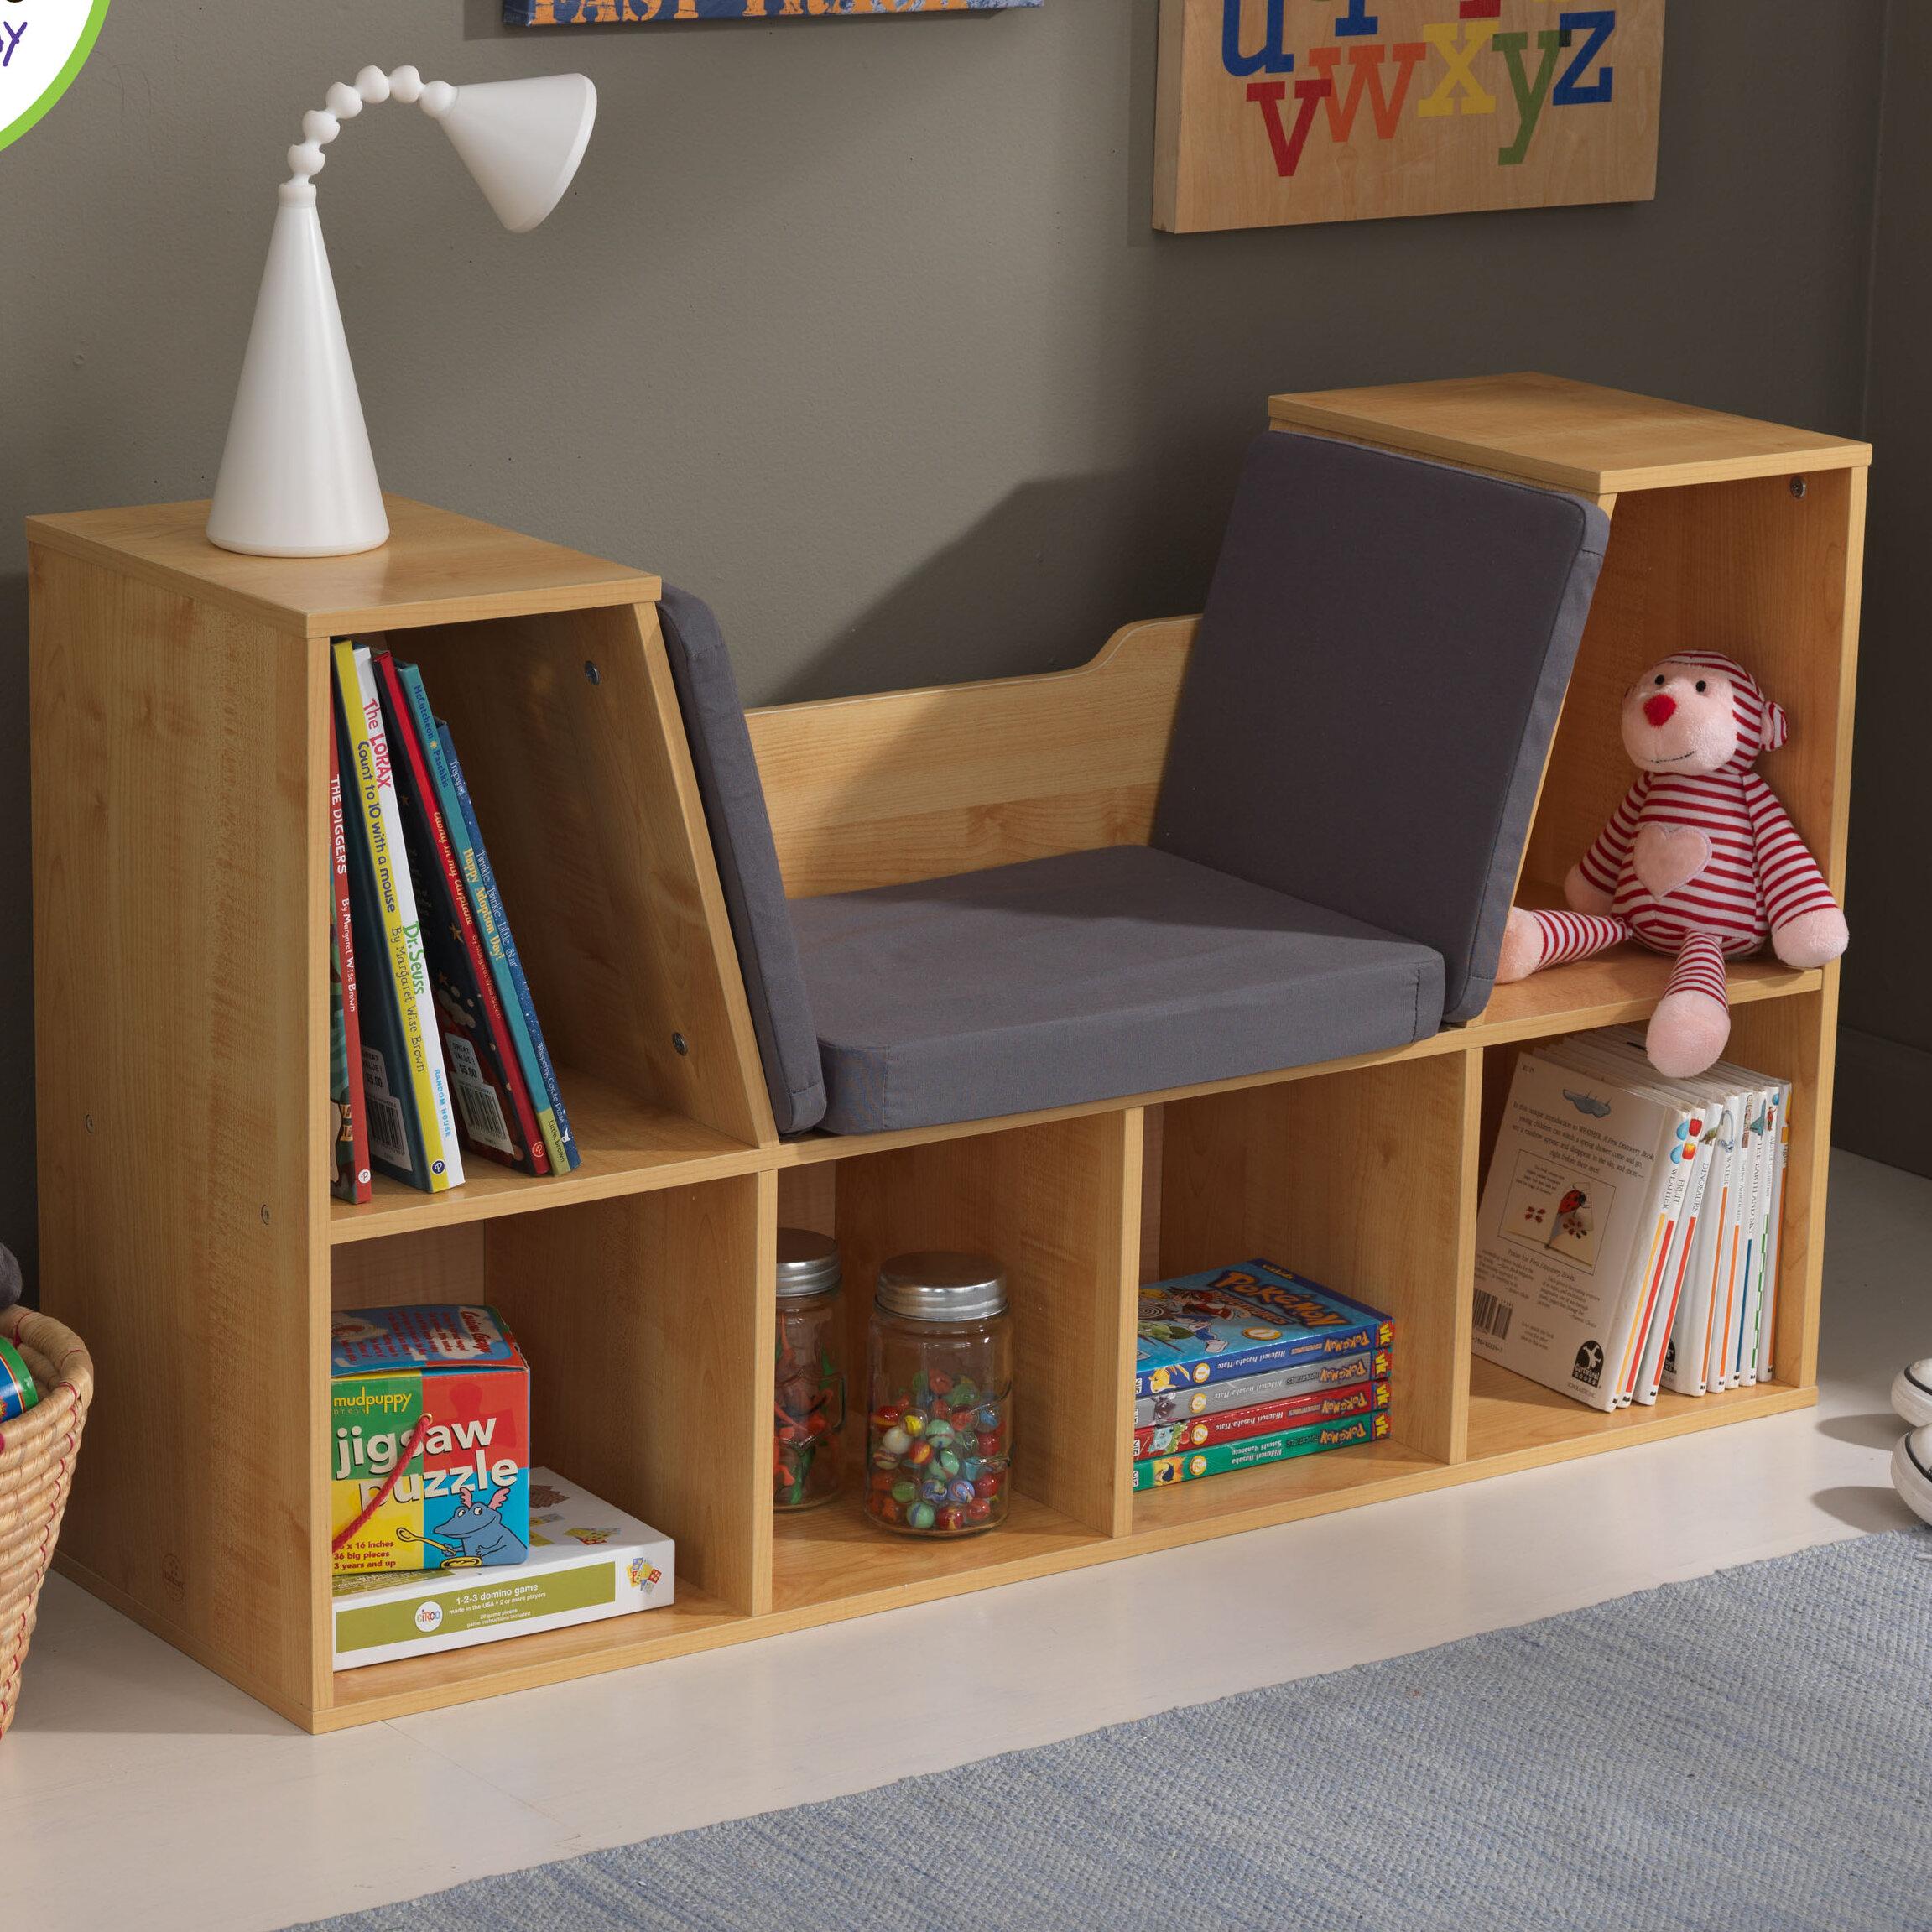 reviews fantasy kids baby space wayfair outer letter pdx fields bookshelf